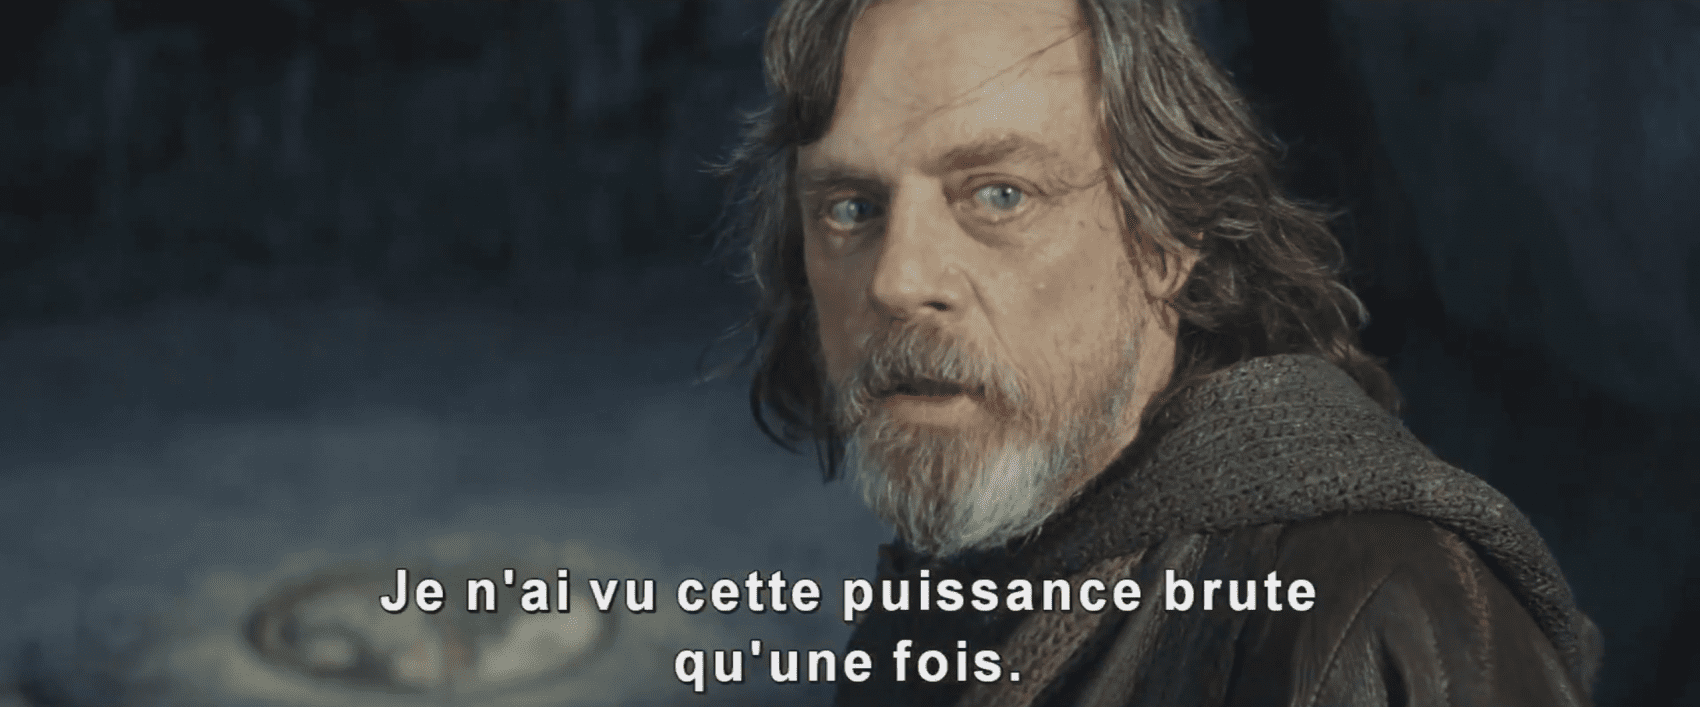 Star Wars The Last Jedi My Geek Actu Trailer Luke.png